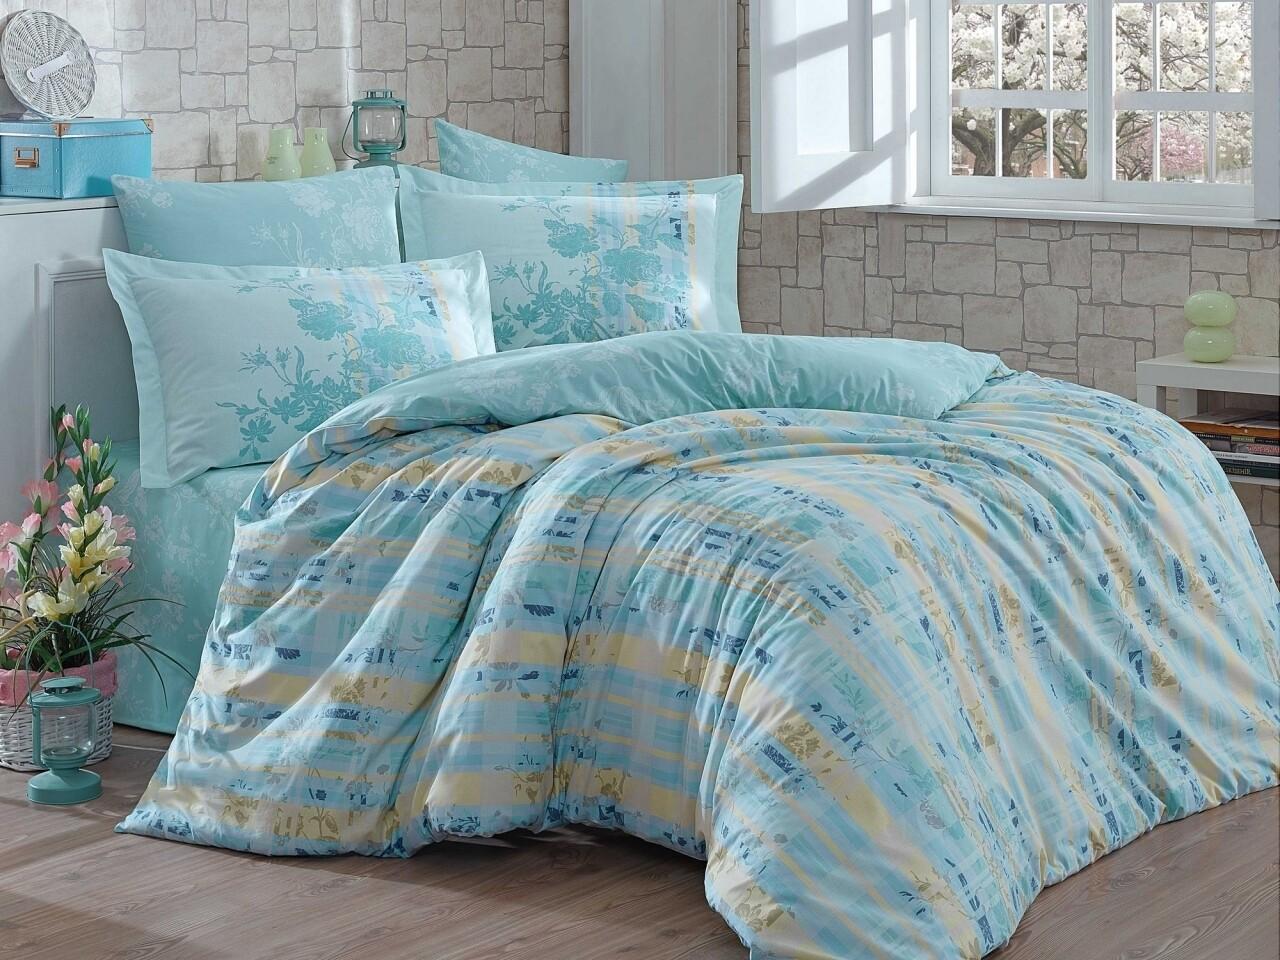 Lenjerie de pat pentru o persoana, 3 piese, 100% bumbac poplin, Hobby, Elenora, verde